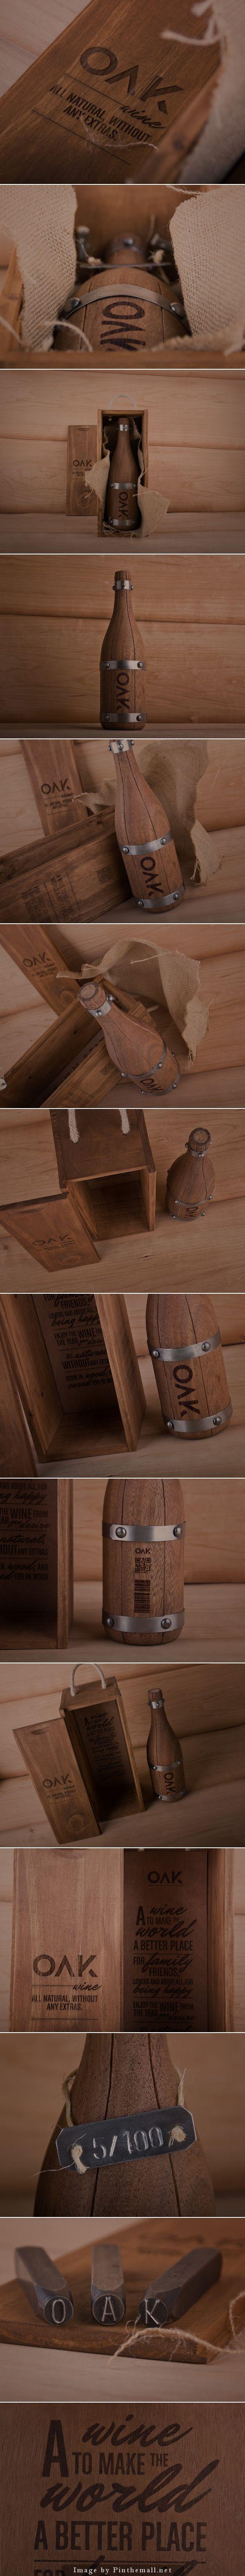 OAK Wine (Concept) Collaboration project: Grantipo & La Despensa Client: OAK wine Location: Madrid / Spain Project Type: Concept